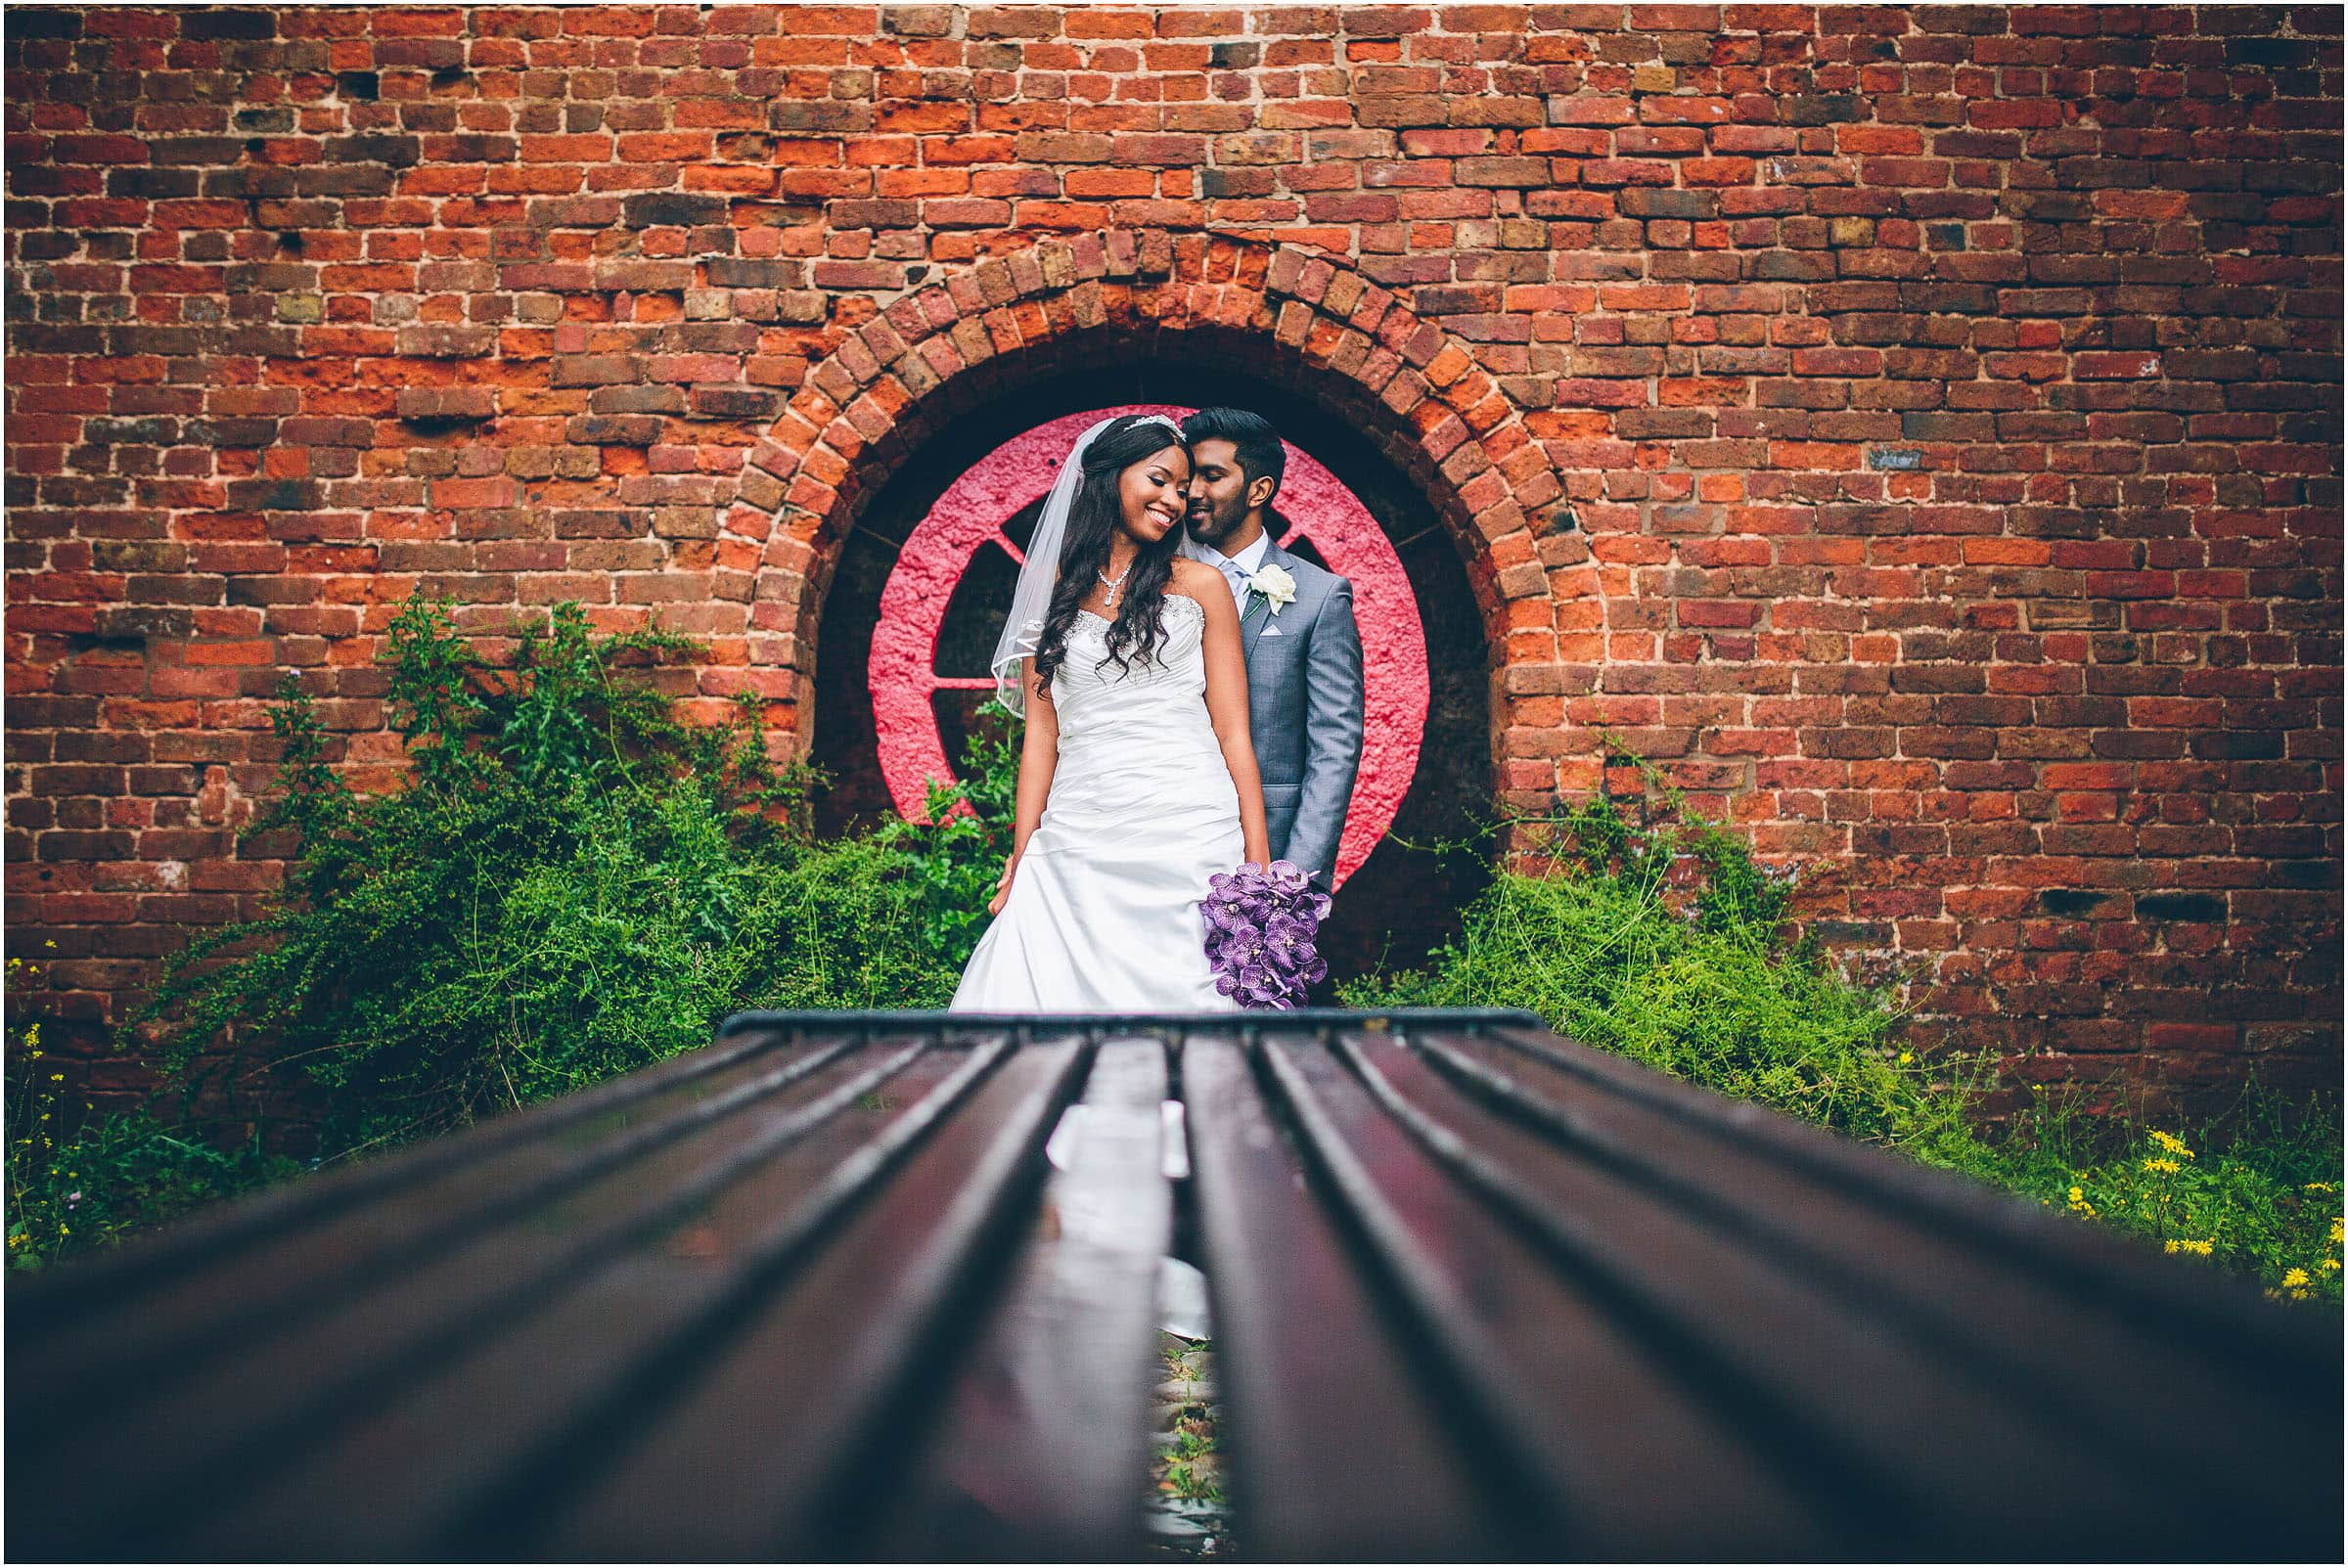 Hilton_Manchester_Wedding_Photography_0092